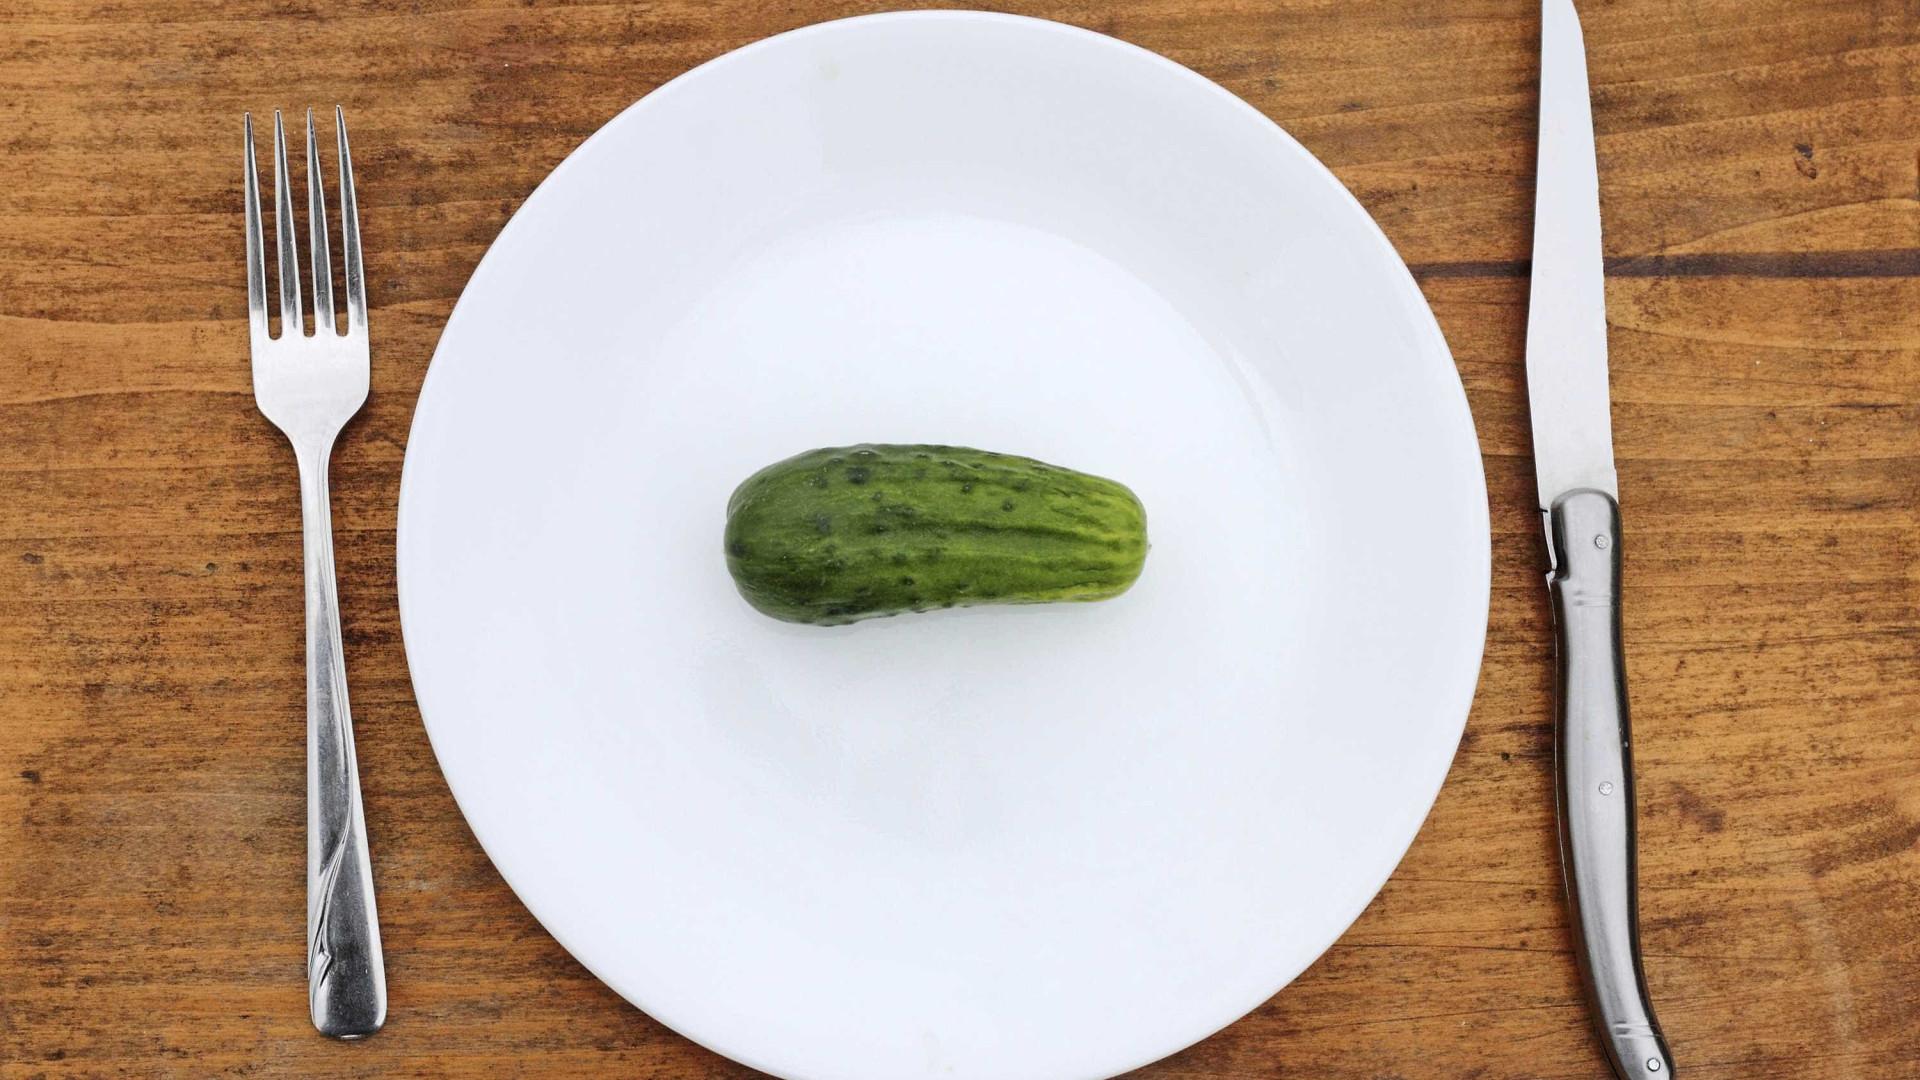 Dietas restritivas engordam, diz especialista